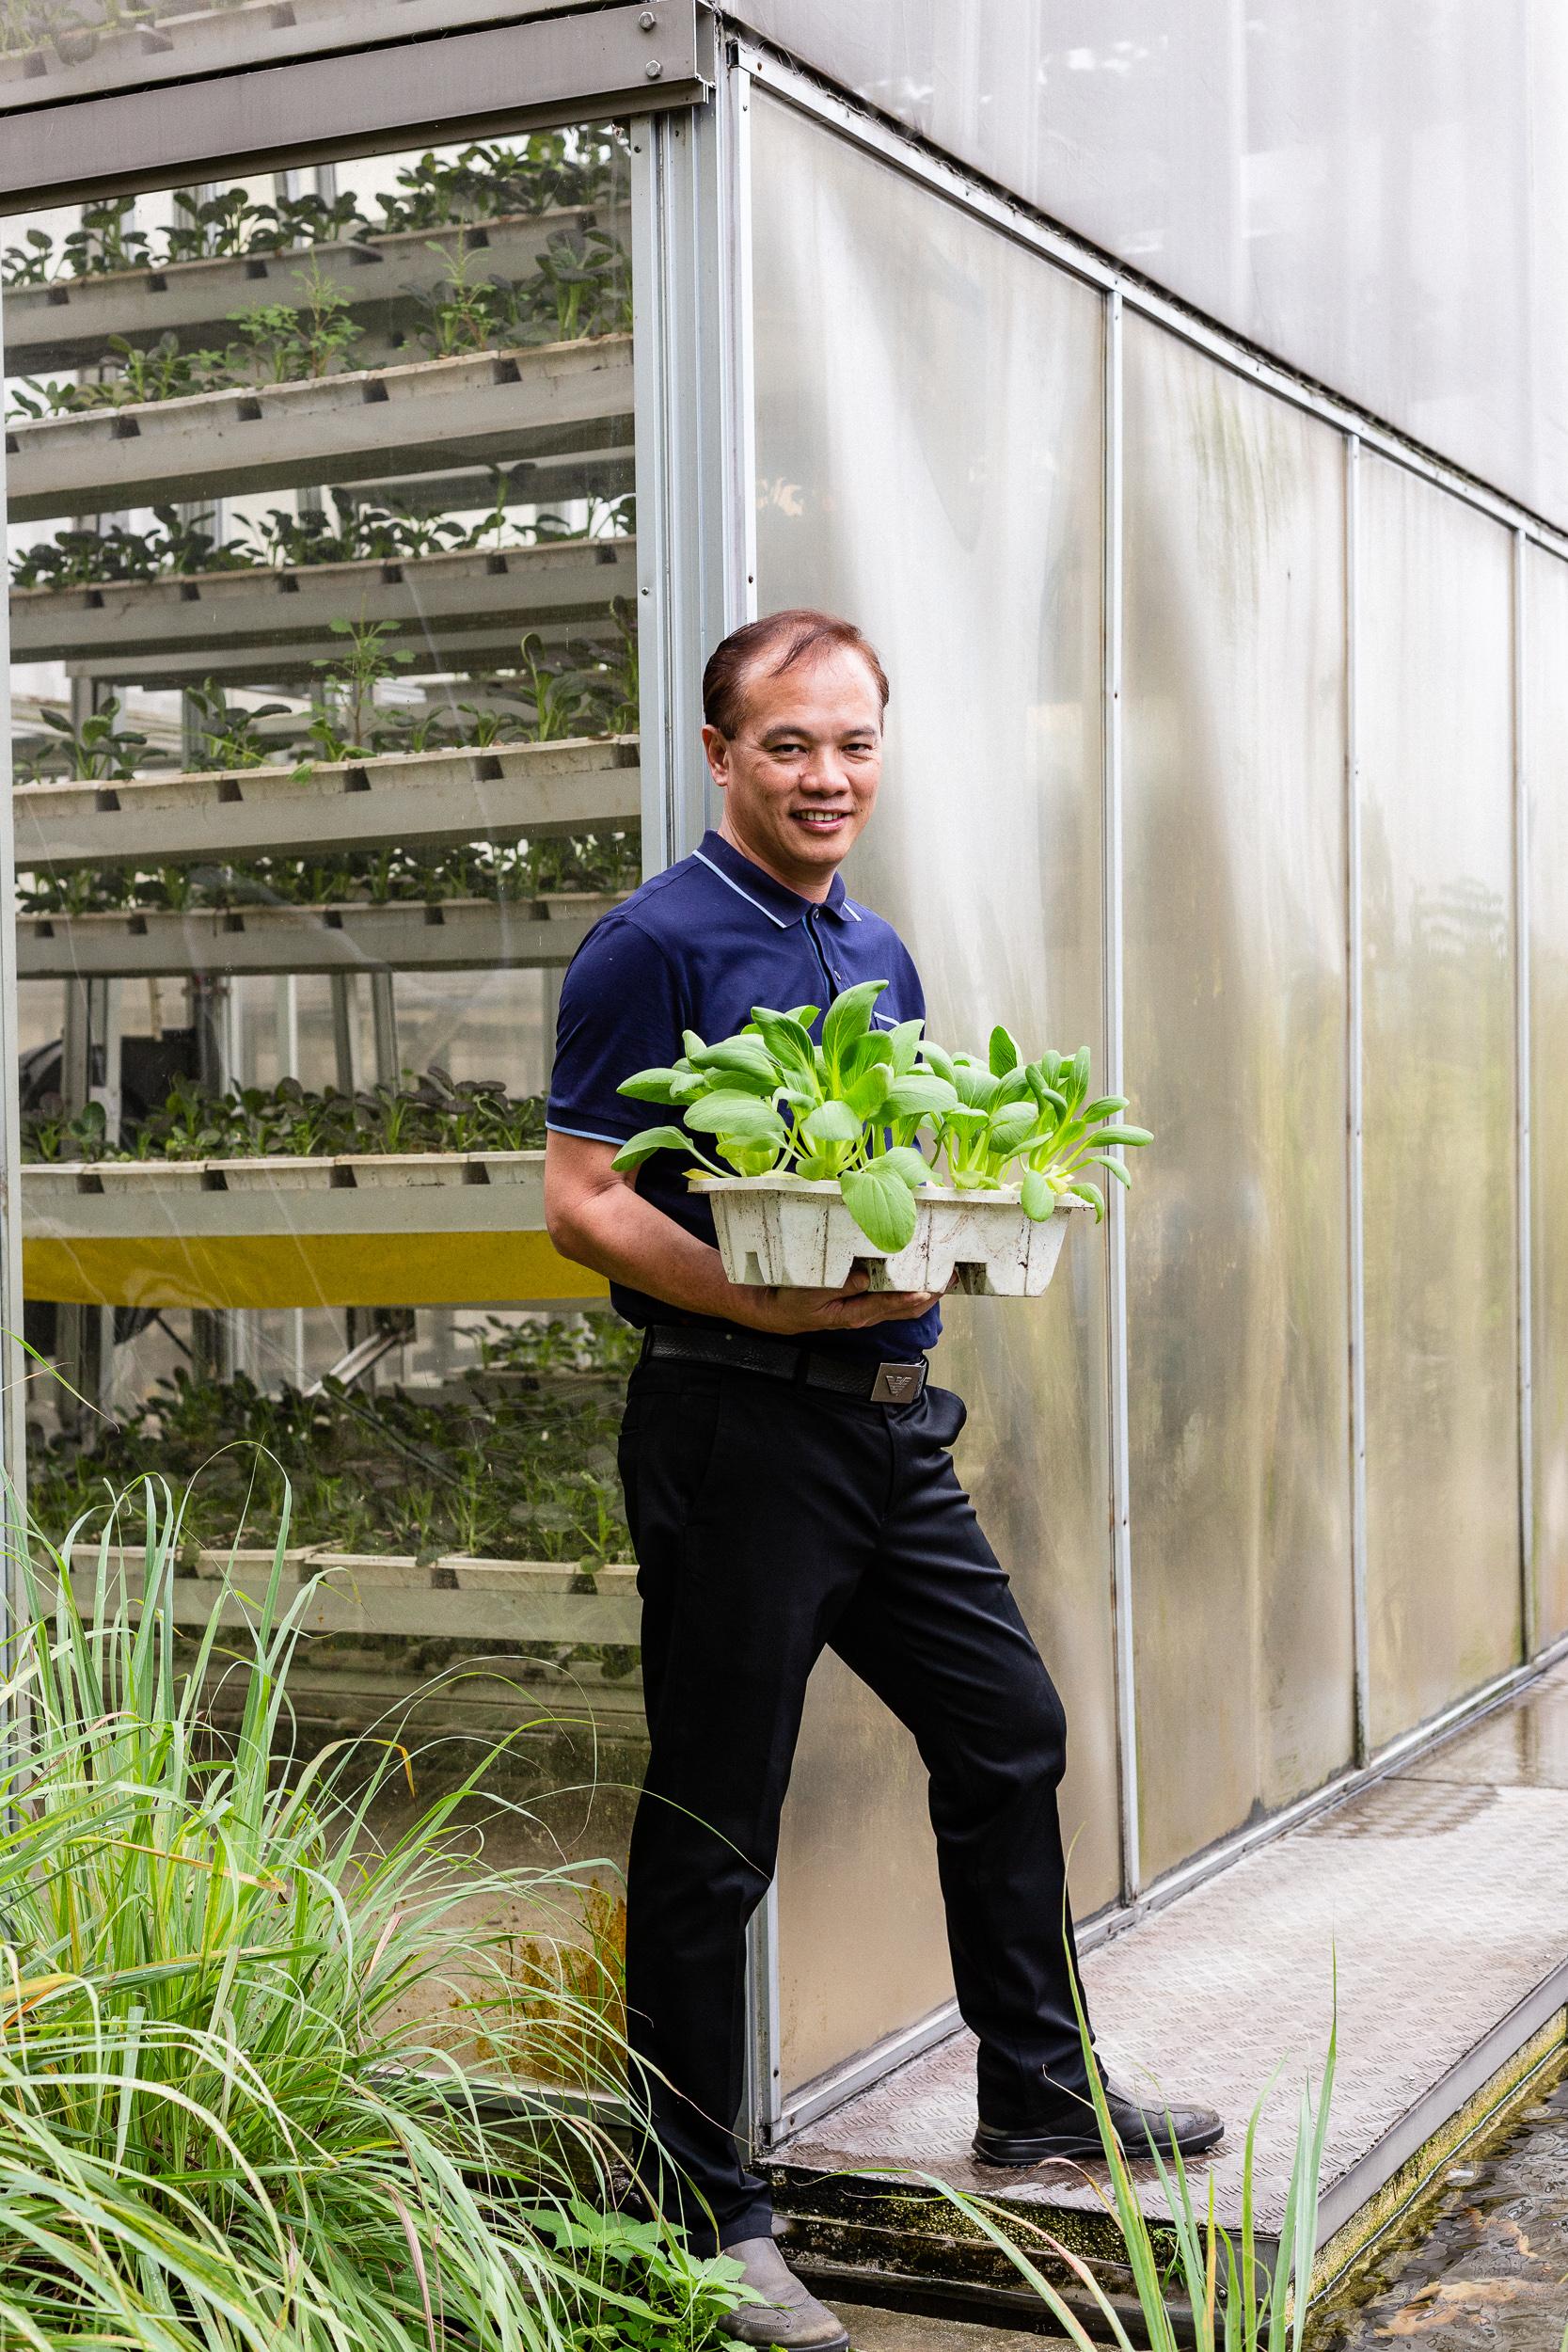 singapore-commercial-editorial-photographer-zainal-zainal-vertical-farming-skygreens-pictet-08.jpg